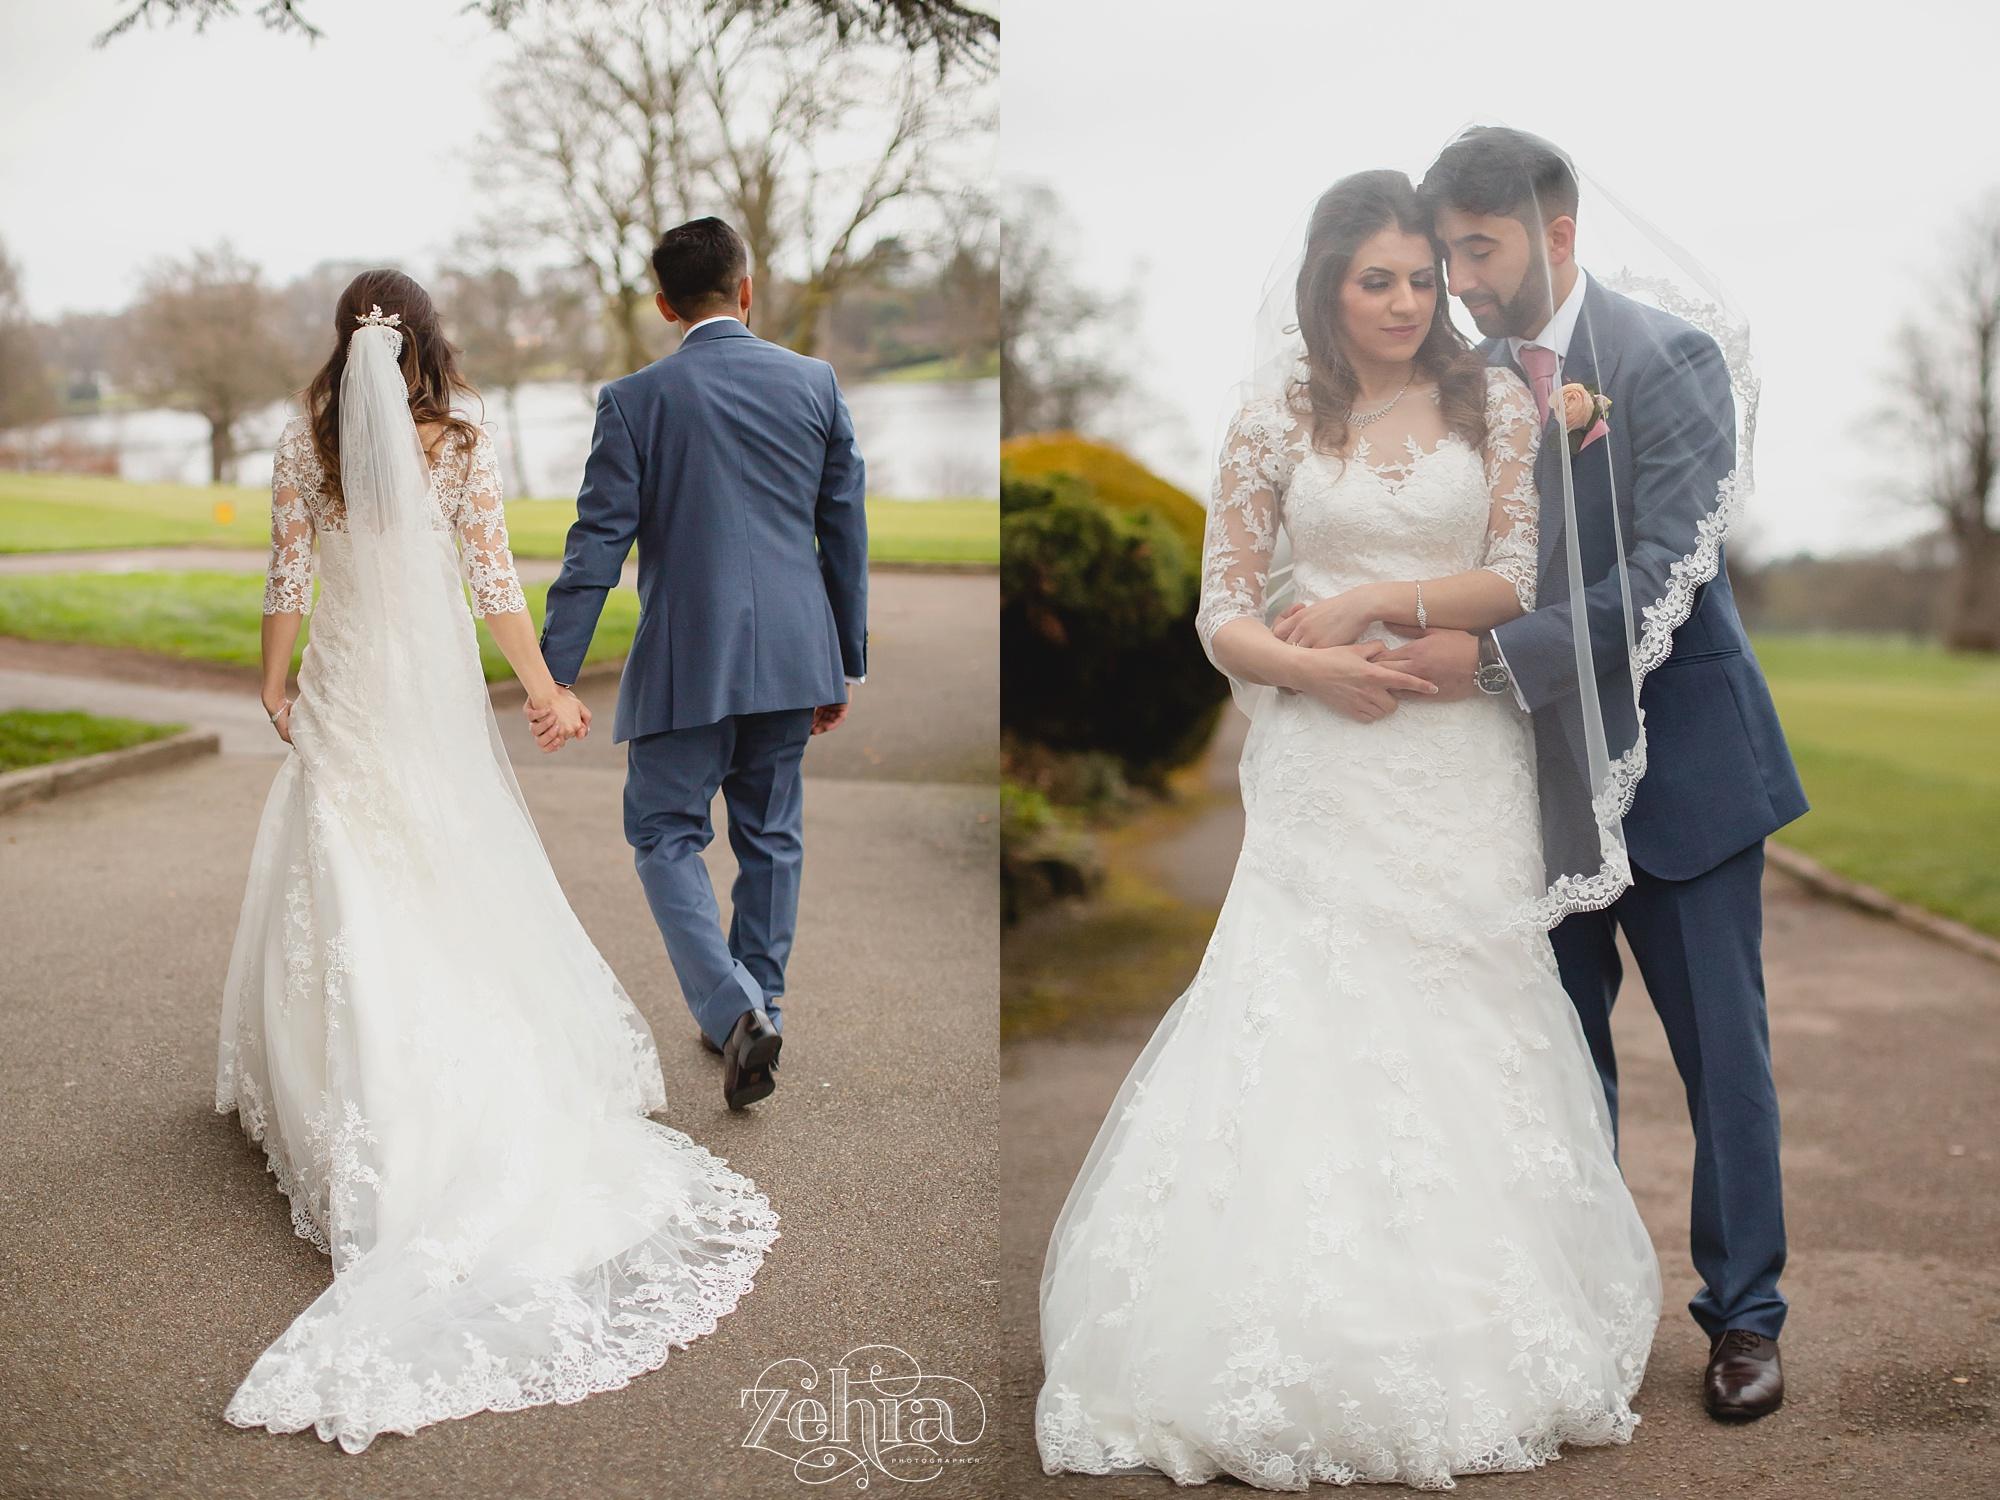 zehra photographer mere cheshire wedding_0046.jpg